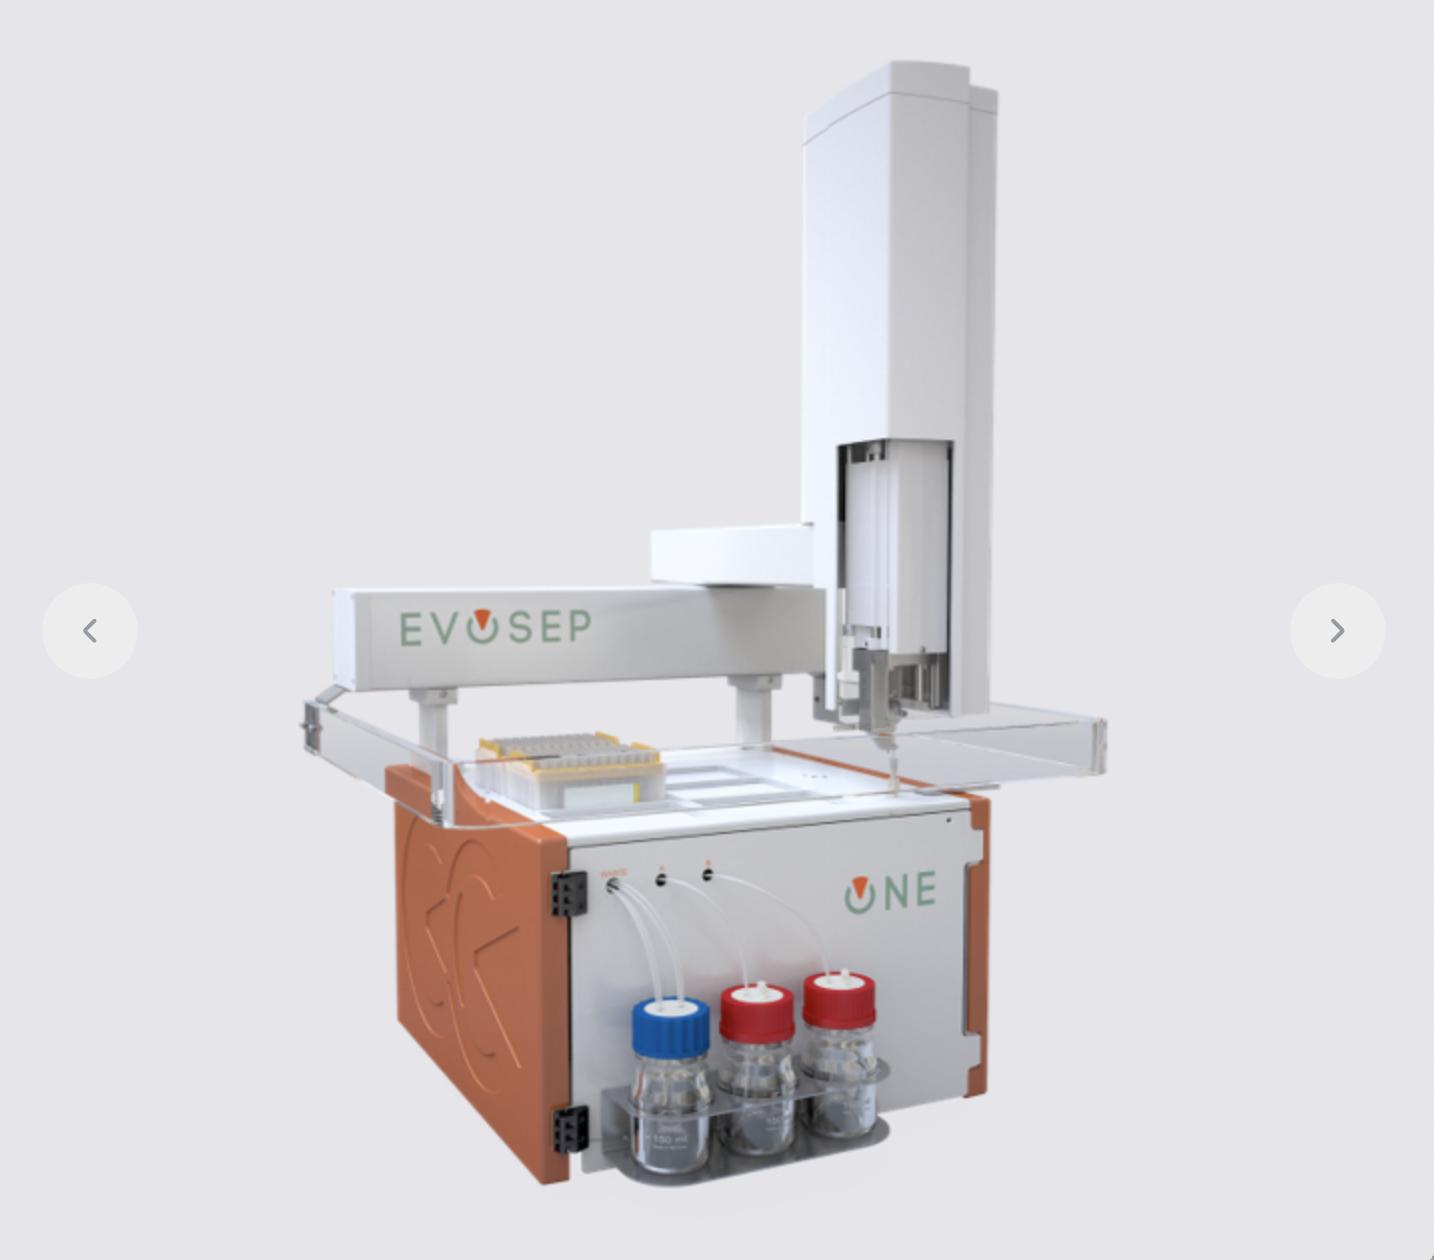 Evosep One高通量蛋白组学分离系统